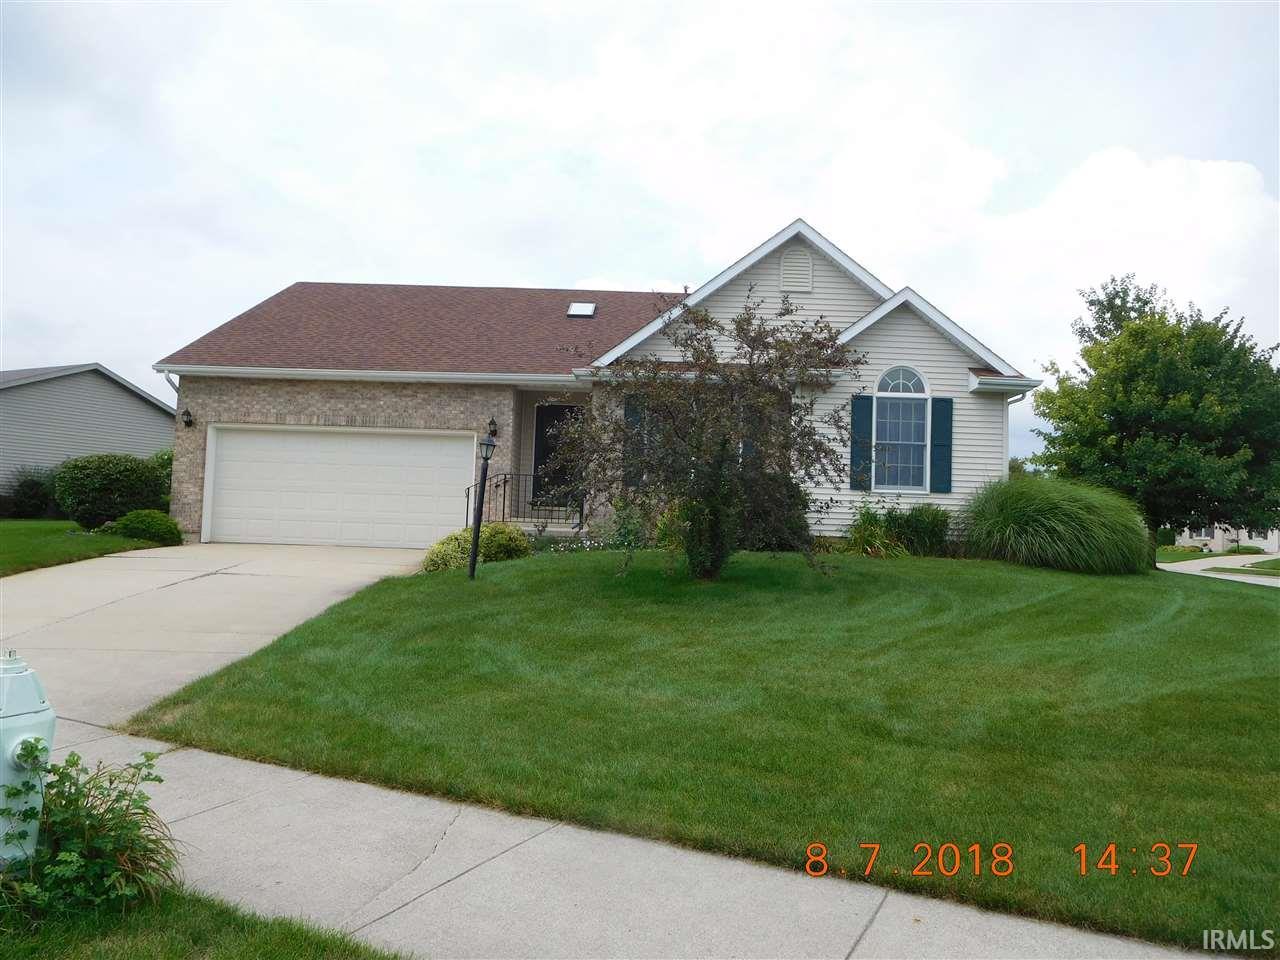 709 Villa South Bend, IN 46614